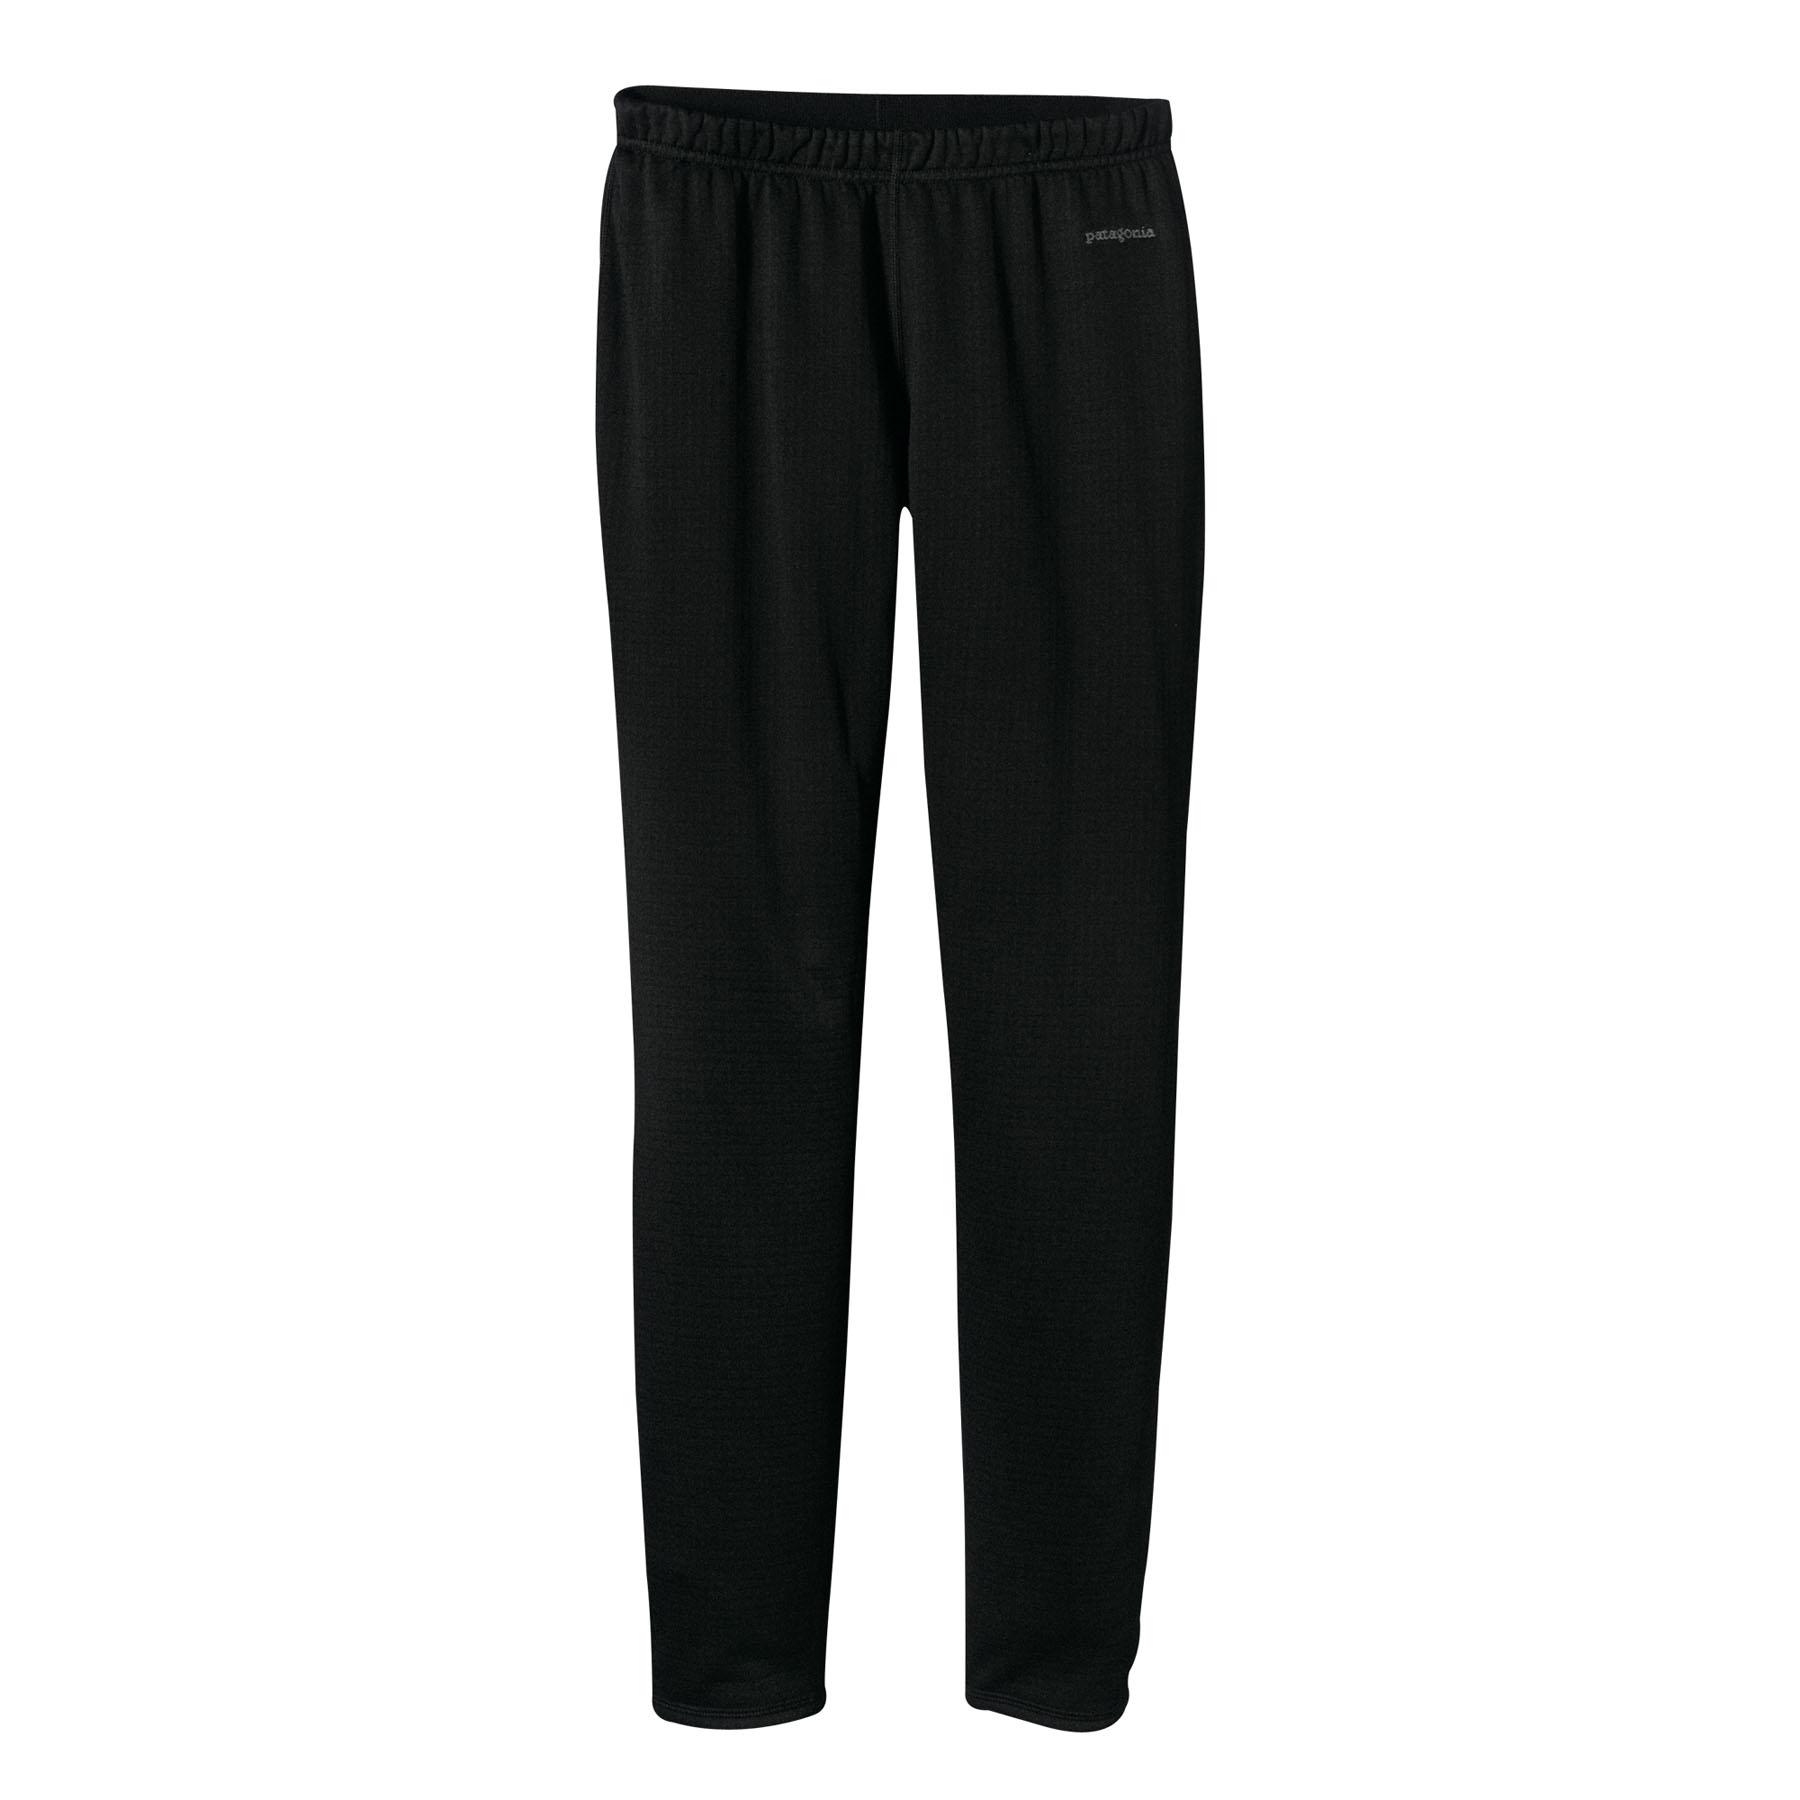 PATAGONIA W'S R1 PANTS (40214) - WAS $89